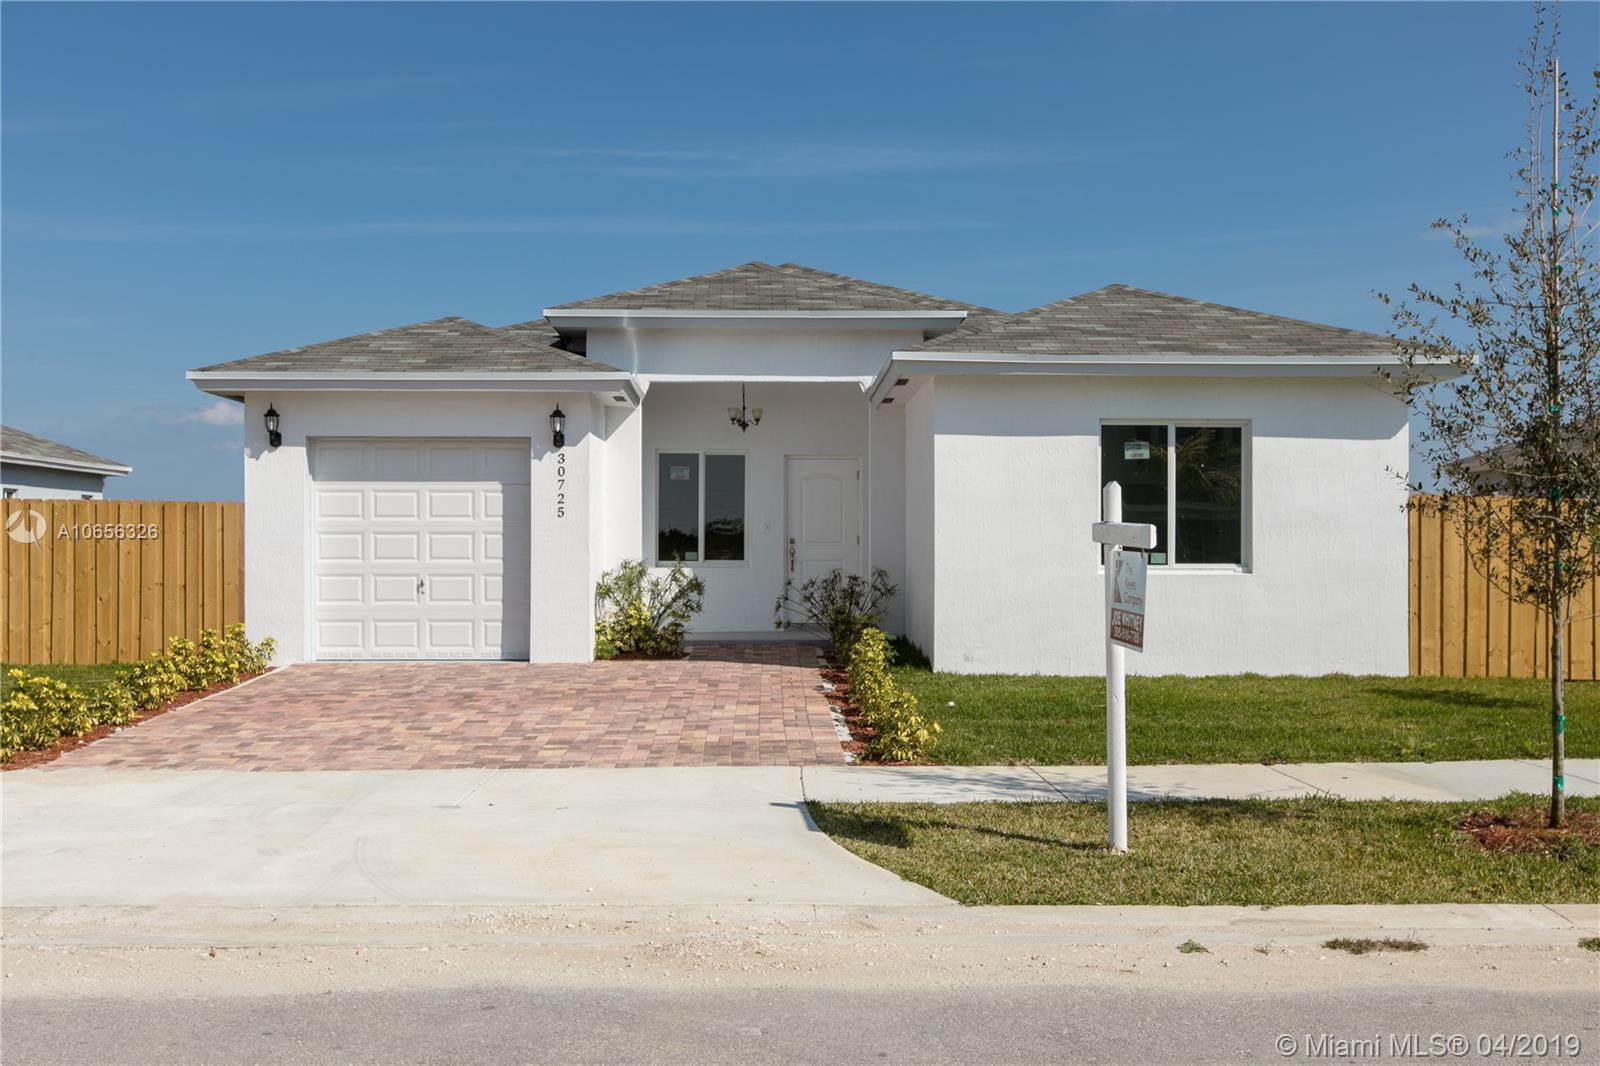 30625 SW 158th Path, Homestead, FL 33033 - Homestead, FL real estate listing